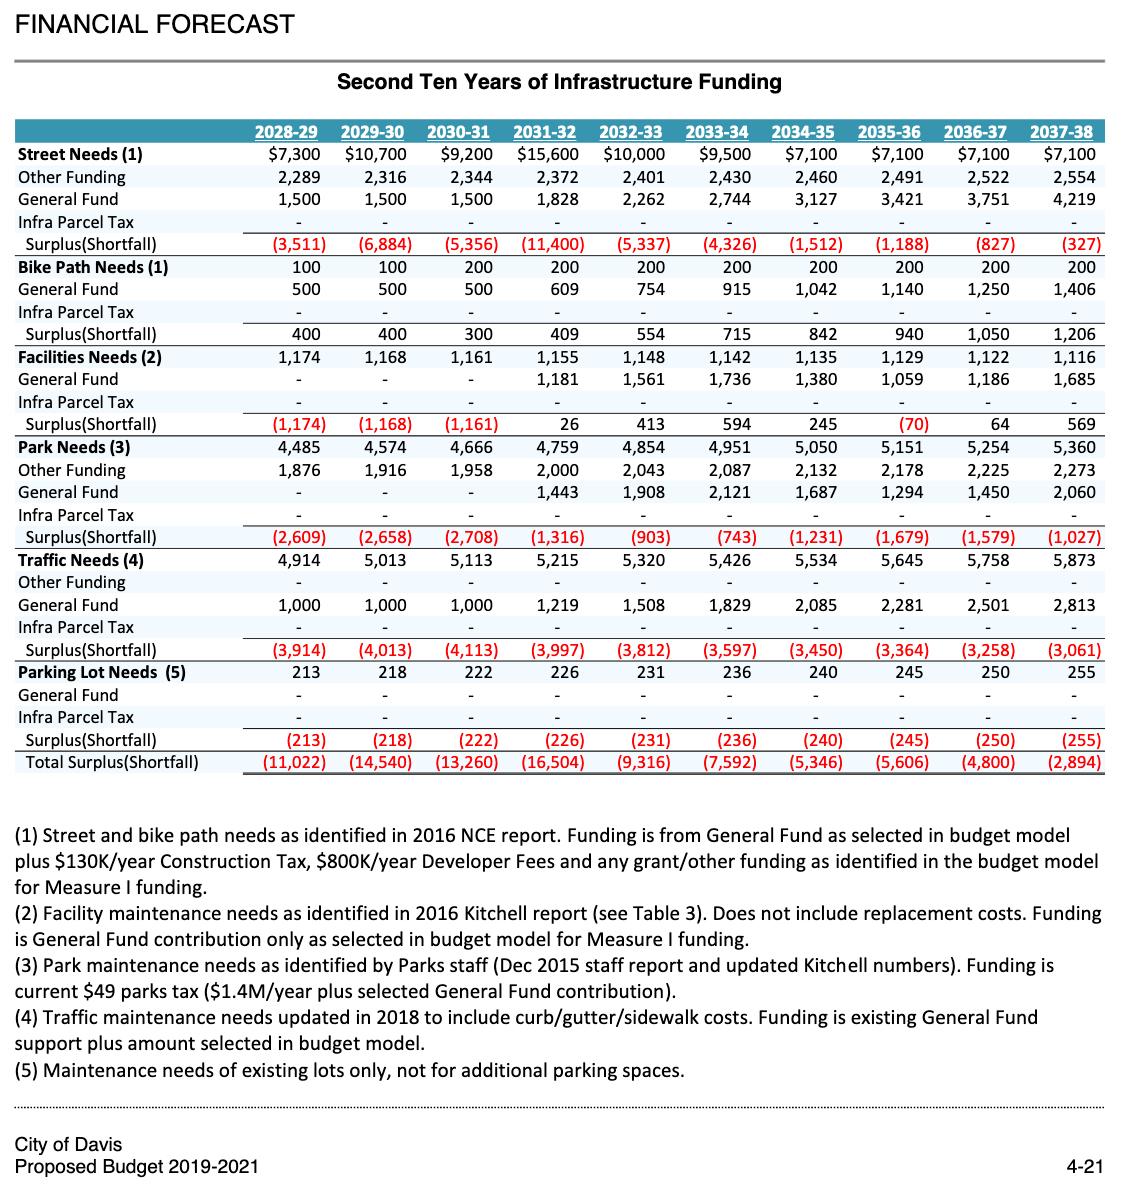 https://www.davisvanguard.org/wp-content/uploads/2019/06/04-Financial-Forecast-Proposed-FY19-20-page-4-21.jpg